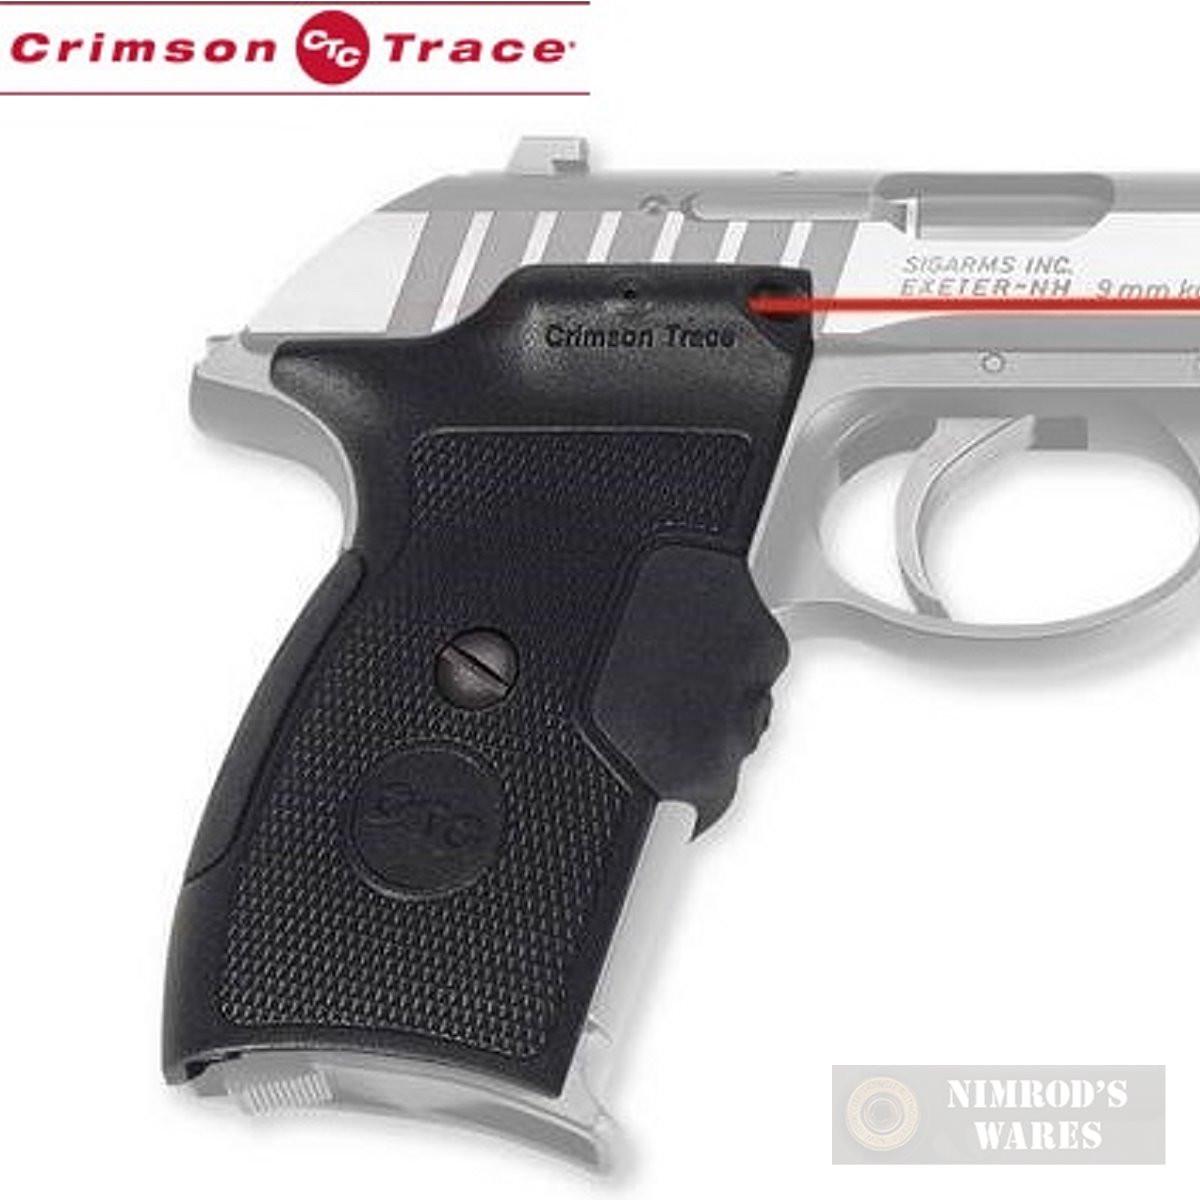 crimson trace sig sauer p230 p232 laser grip sight lg 432